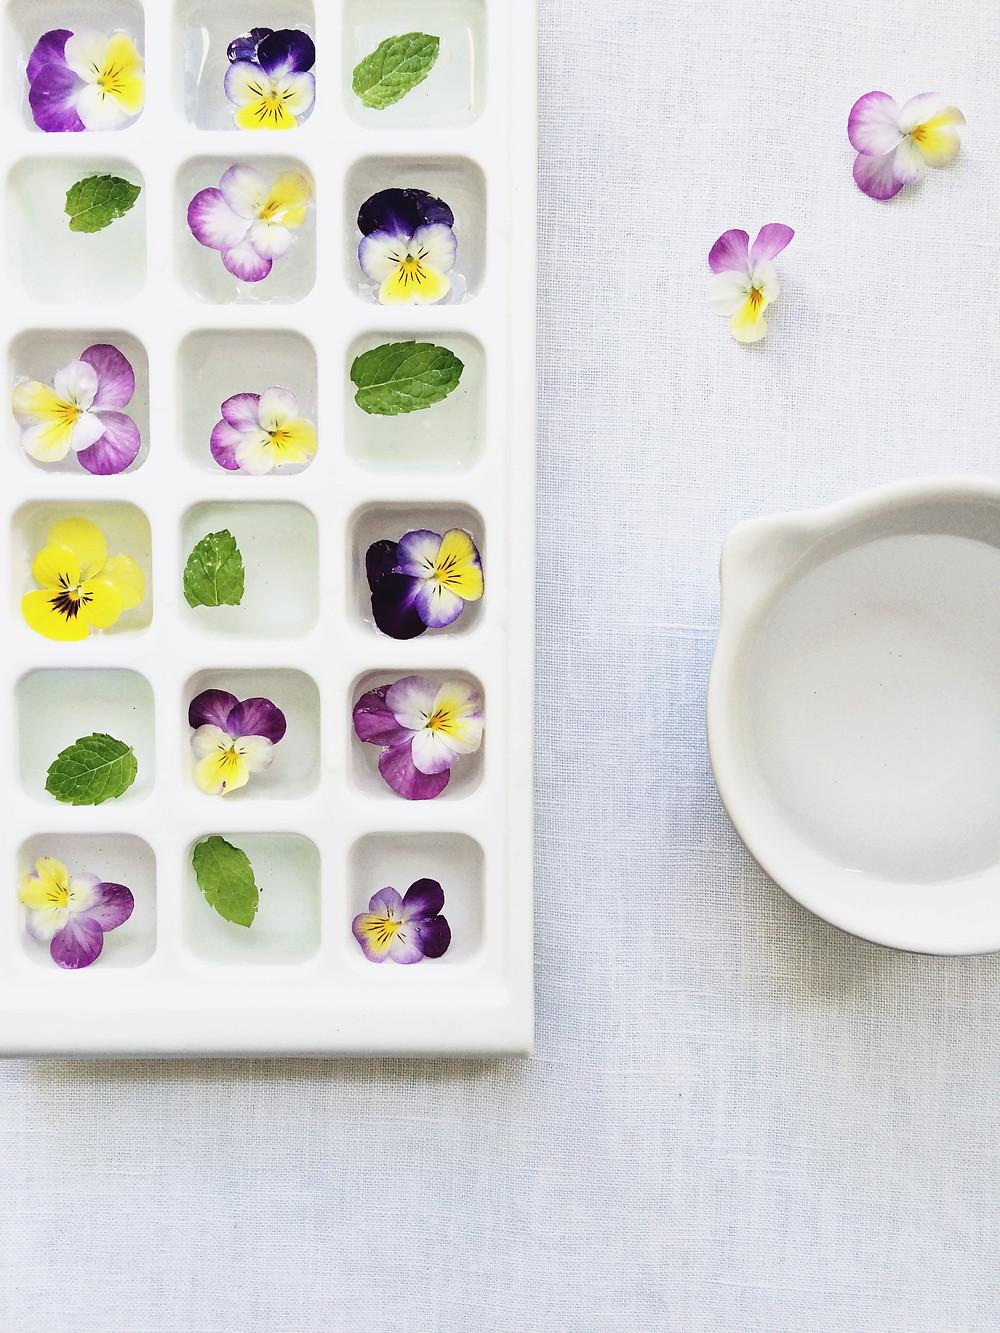 Edible Flower Ice Cubes - Sky Meadow Bakery blog